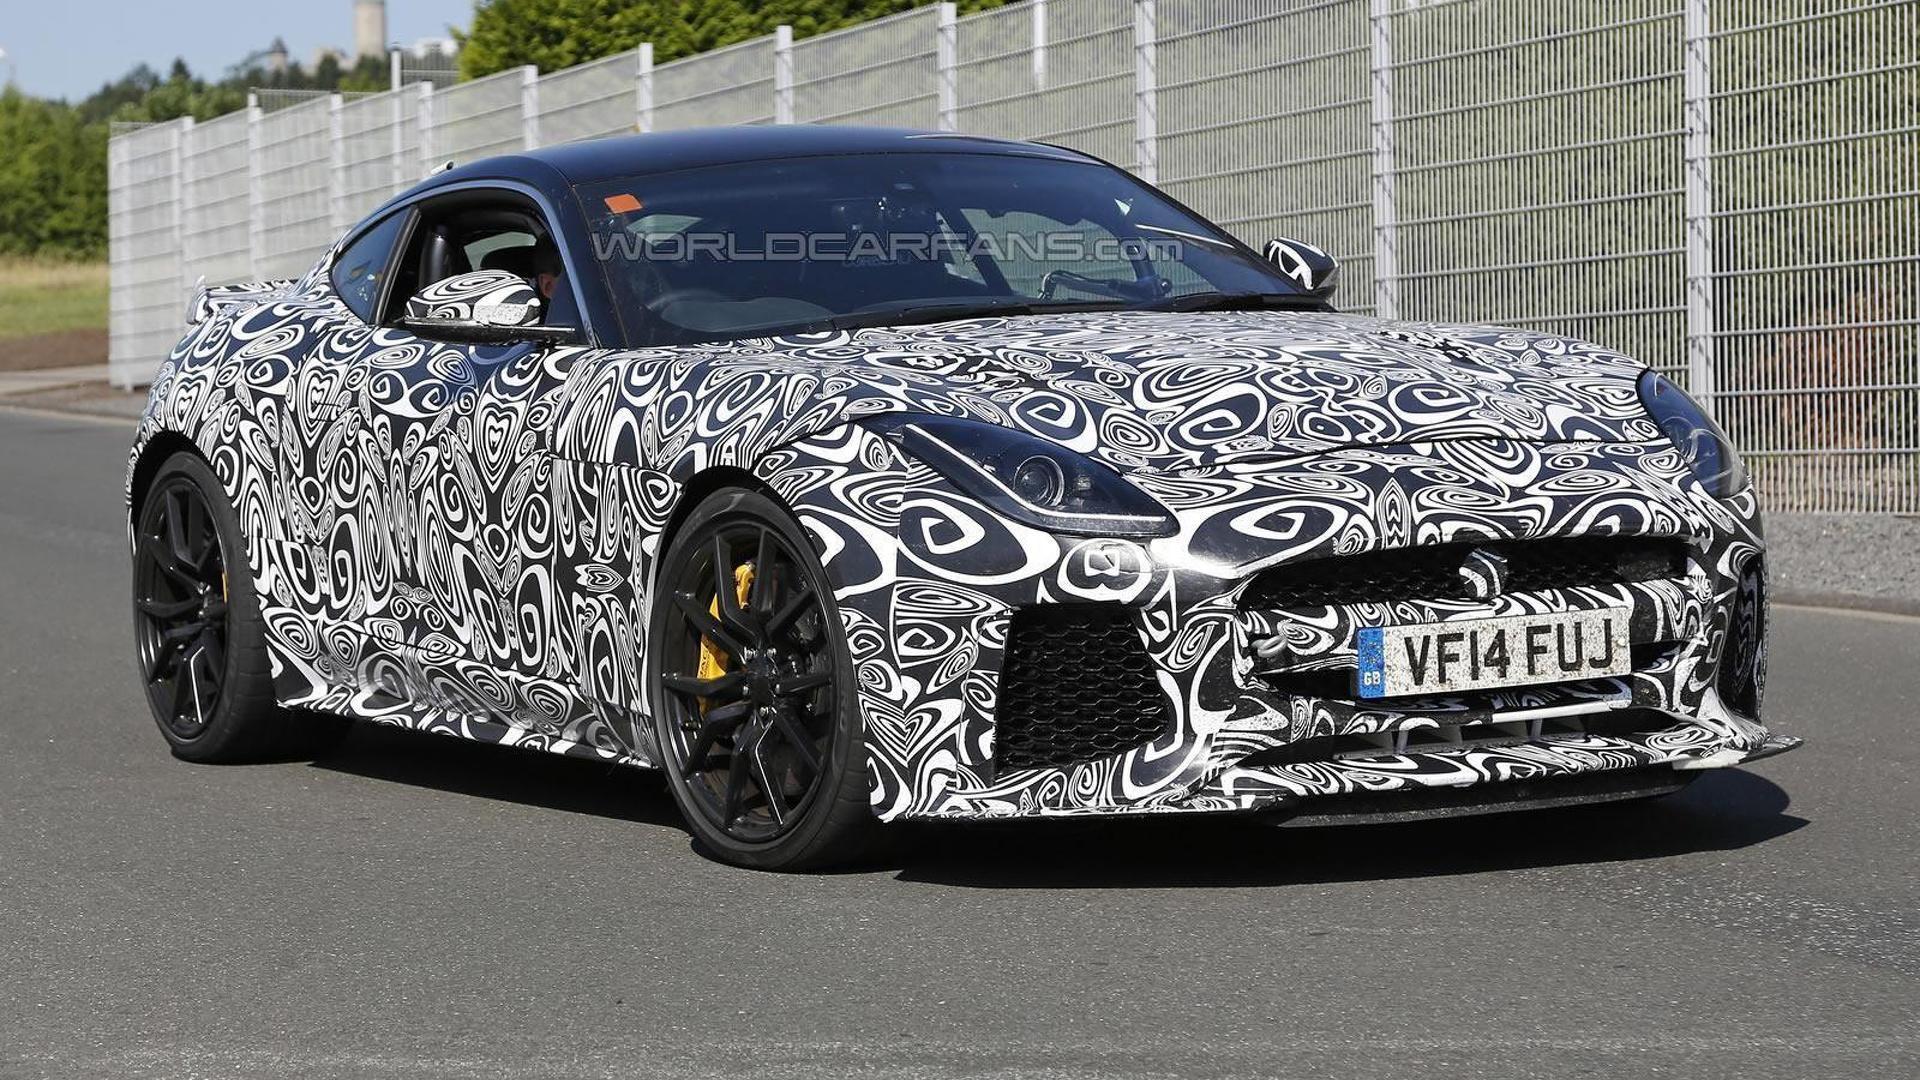 2016 Jaguar F-Type SVR returns to the Nürburgring for intense testing [video]